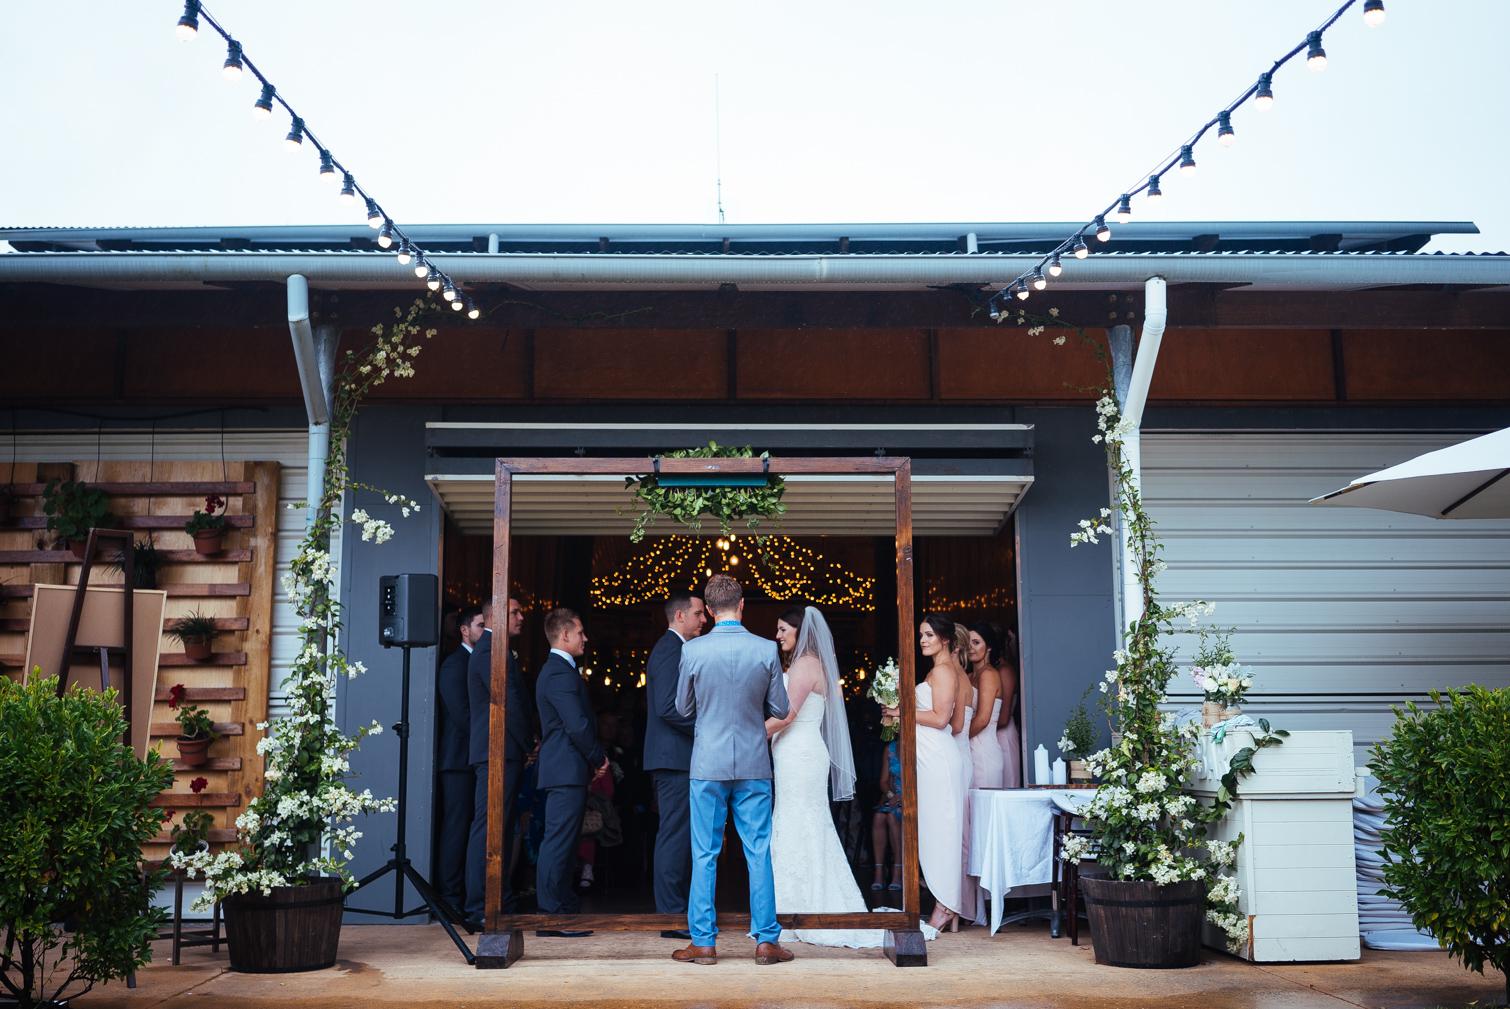 Kingscliffe_male_wedding_celebrant-Benjamin_Carlyle -8.jpg